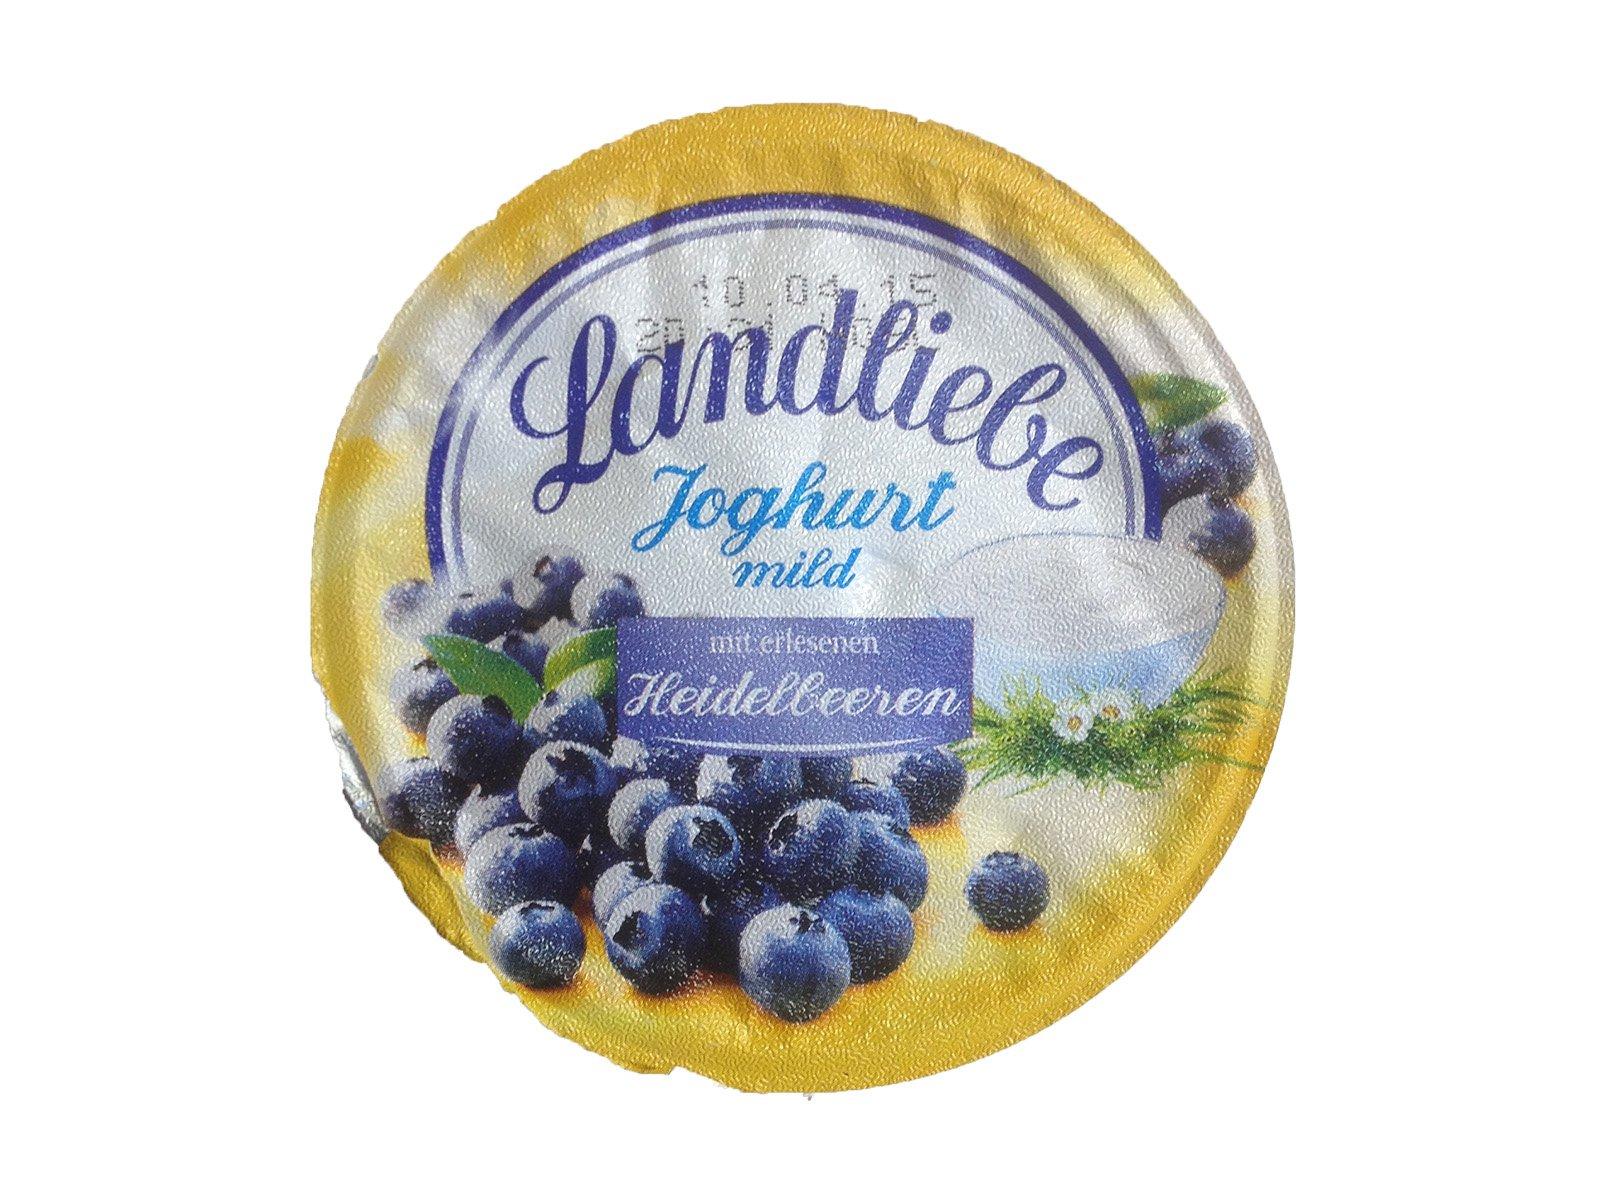 Landliebe Joghurt mild Heidelbeere